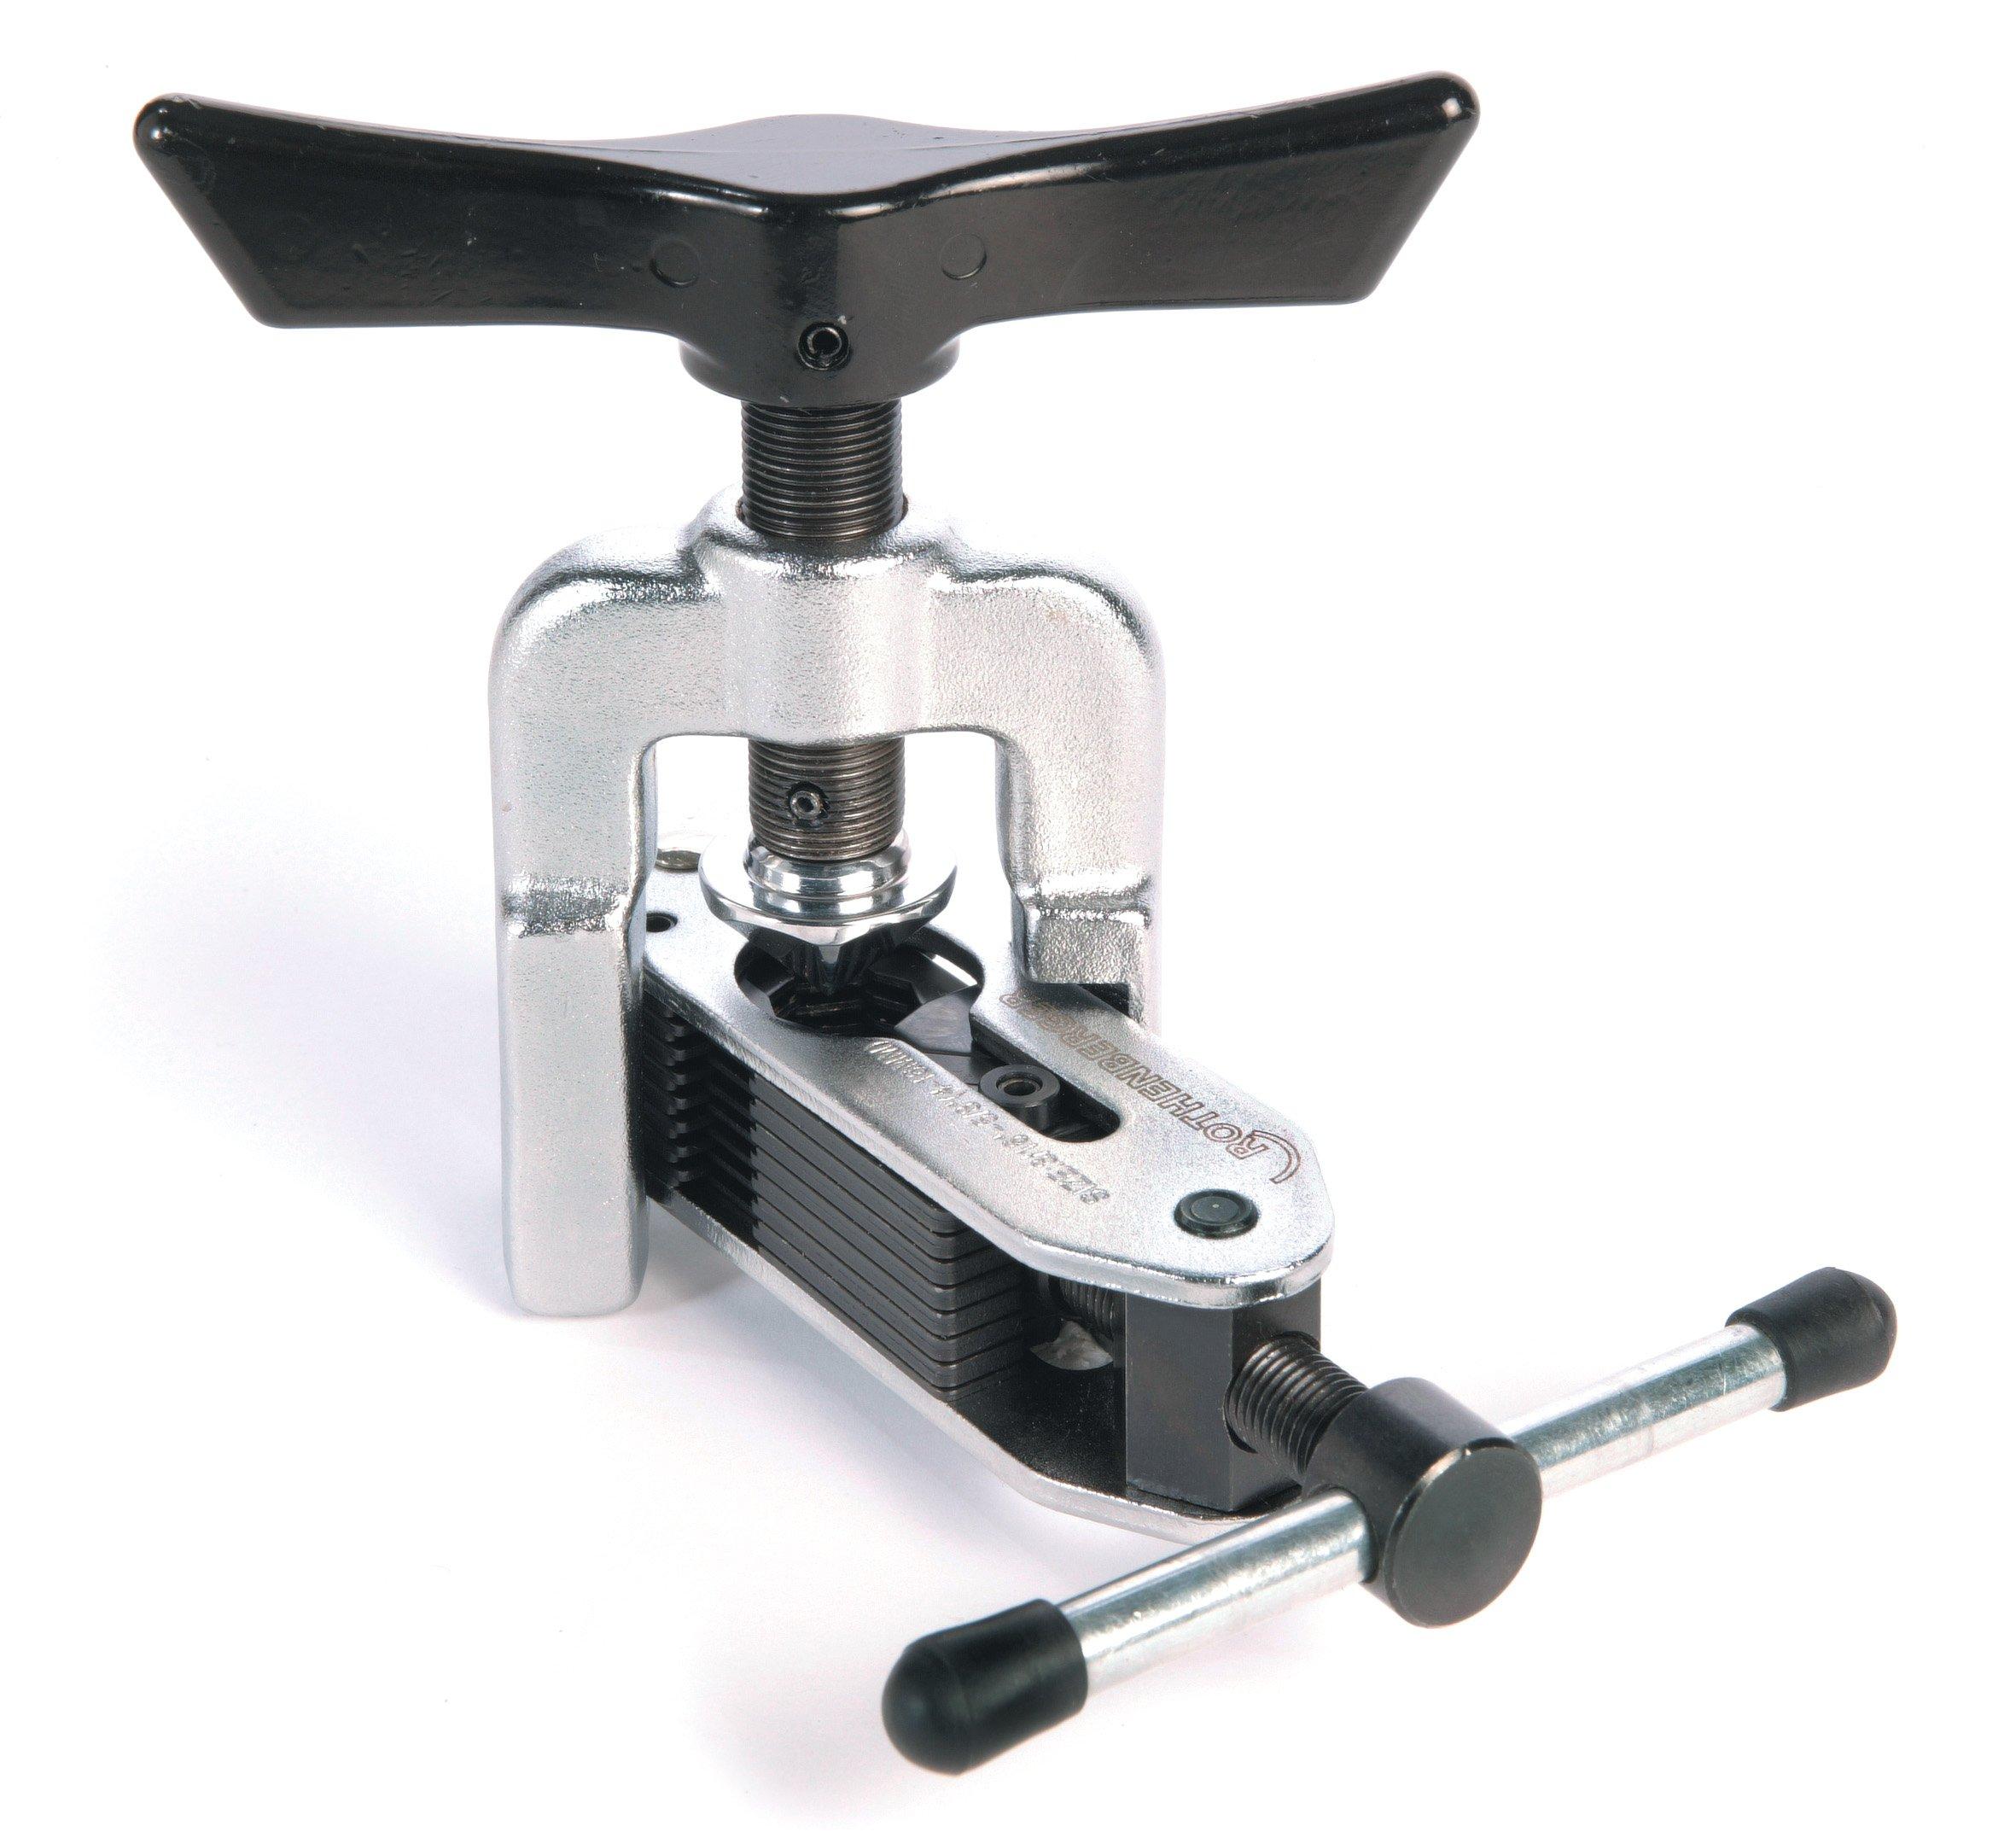 Rothenberger 222601 Universal Flaring Tool, 45-Degree